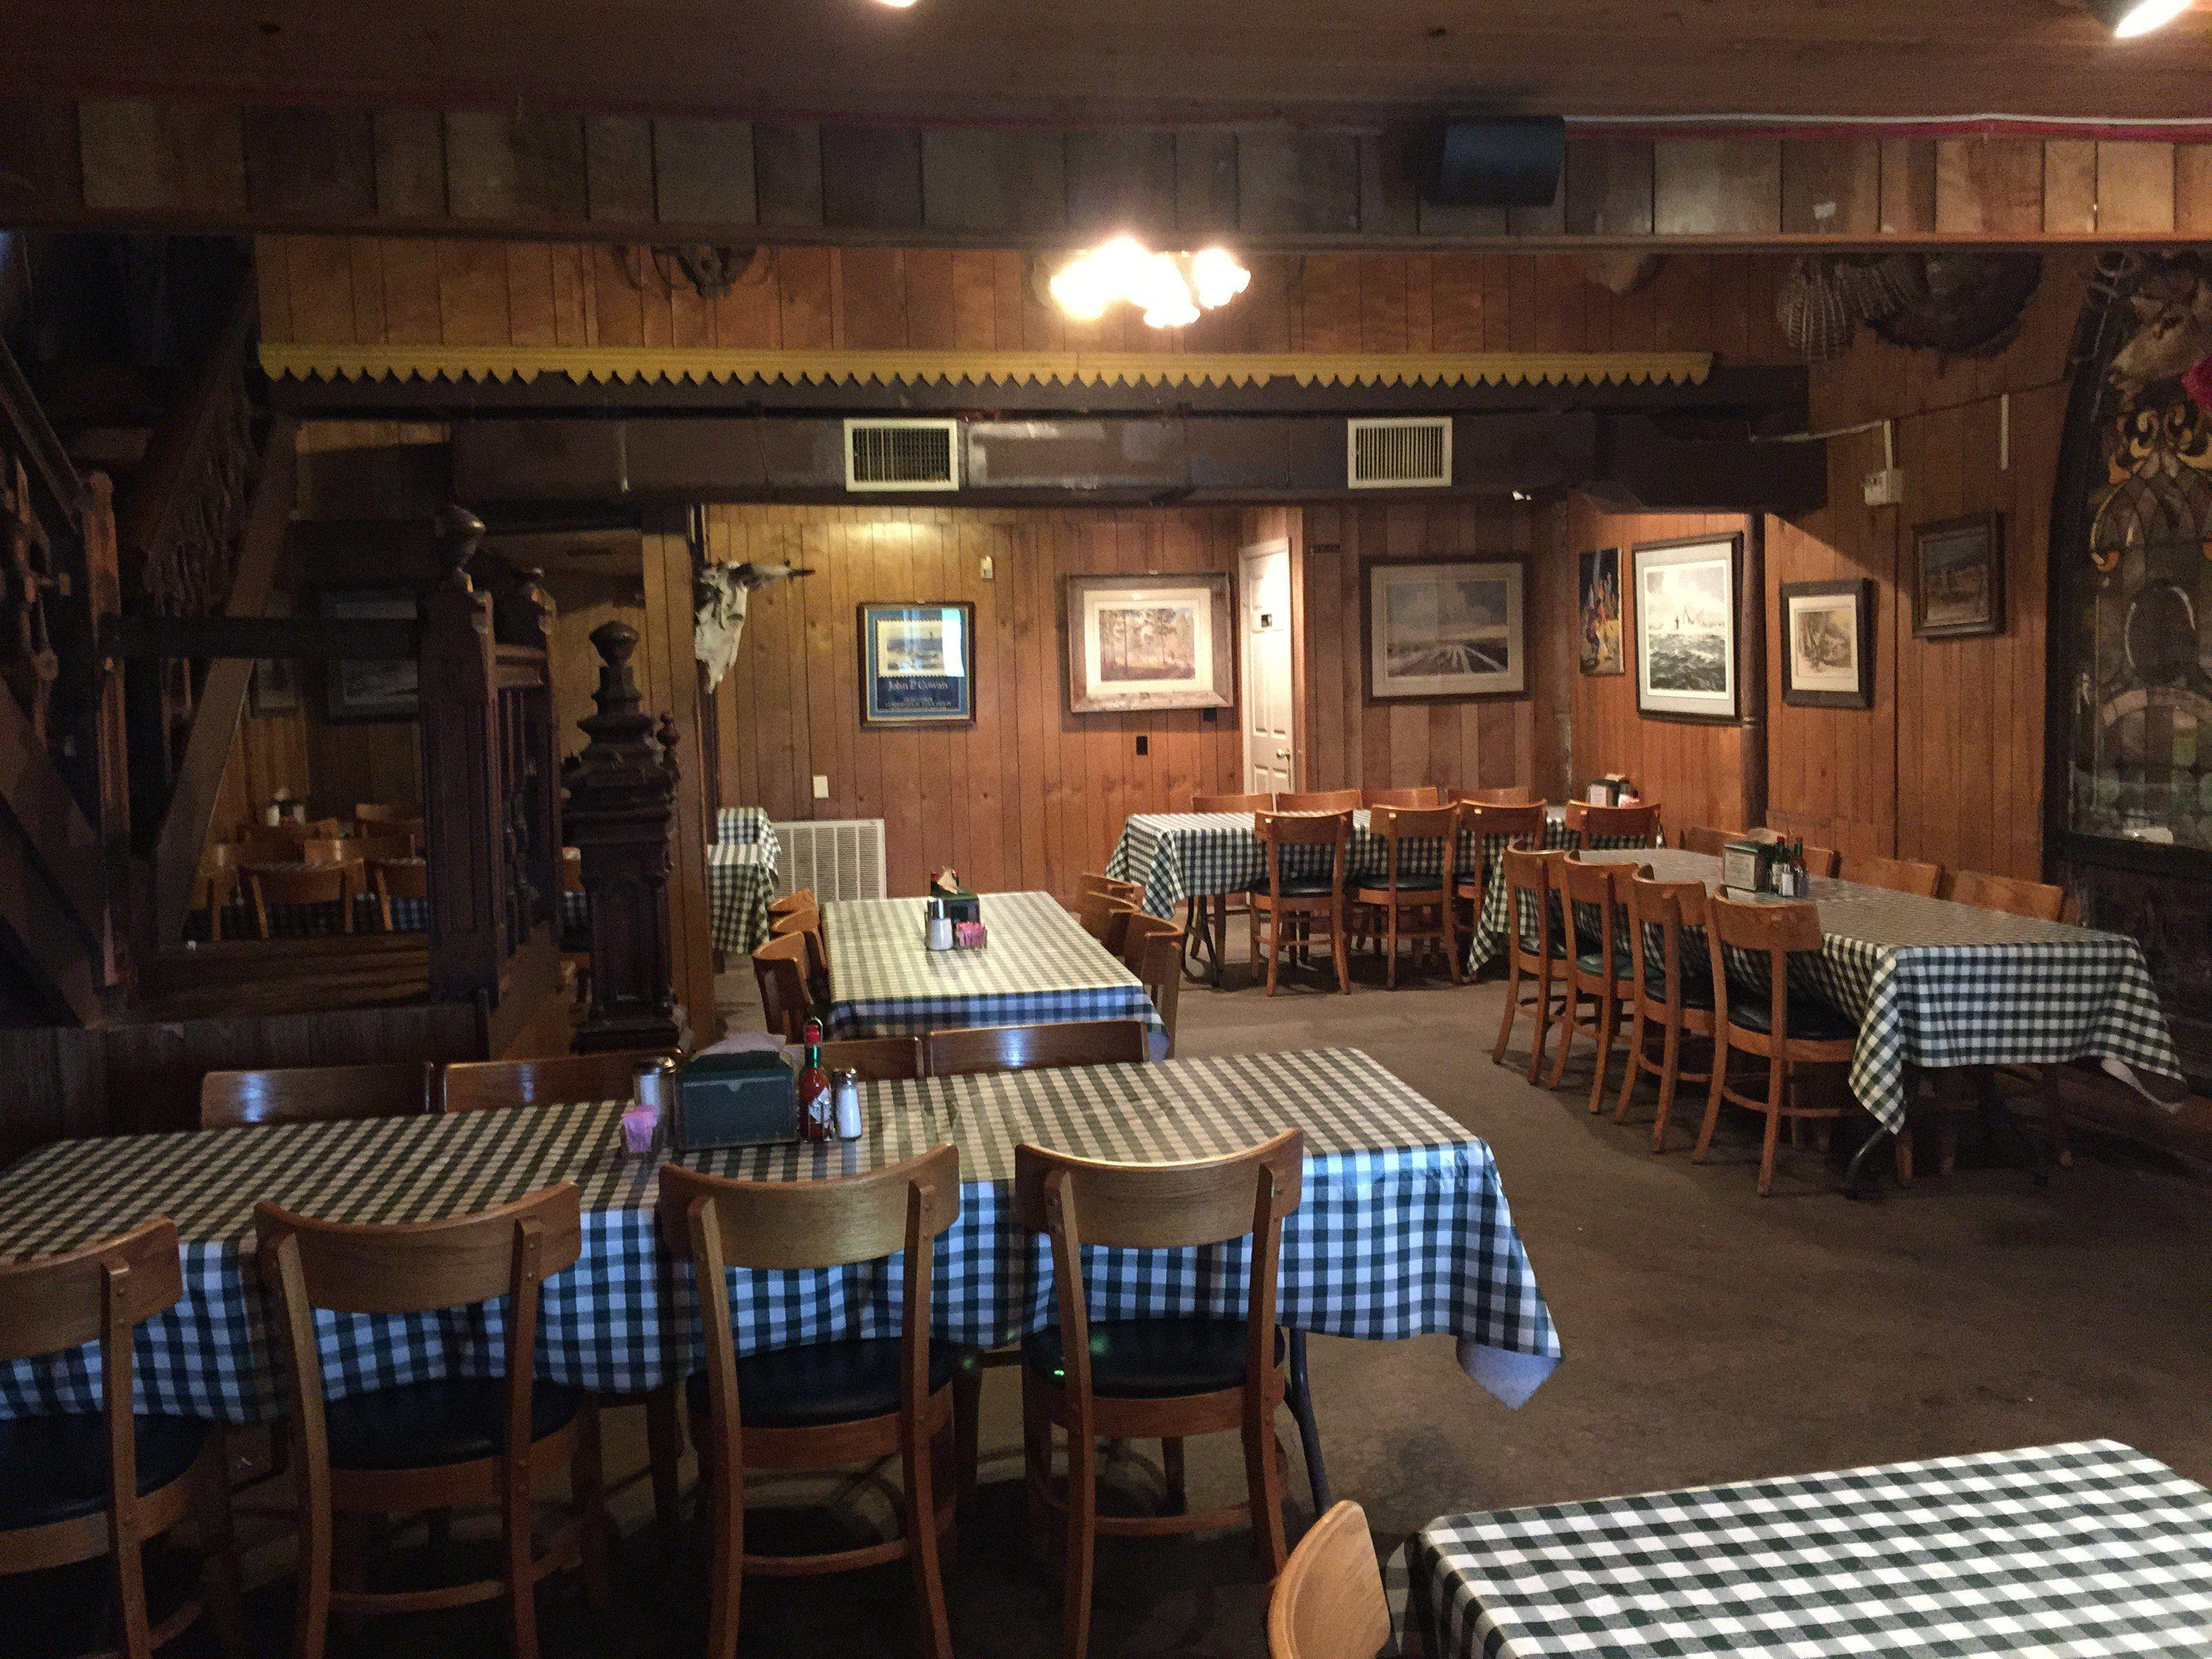 Dine In The Swinging Door Bar B Q Restaurant Richmond Texas Bar B Q Swinging Doors Door Bar